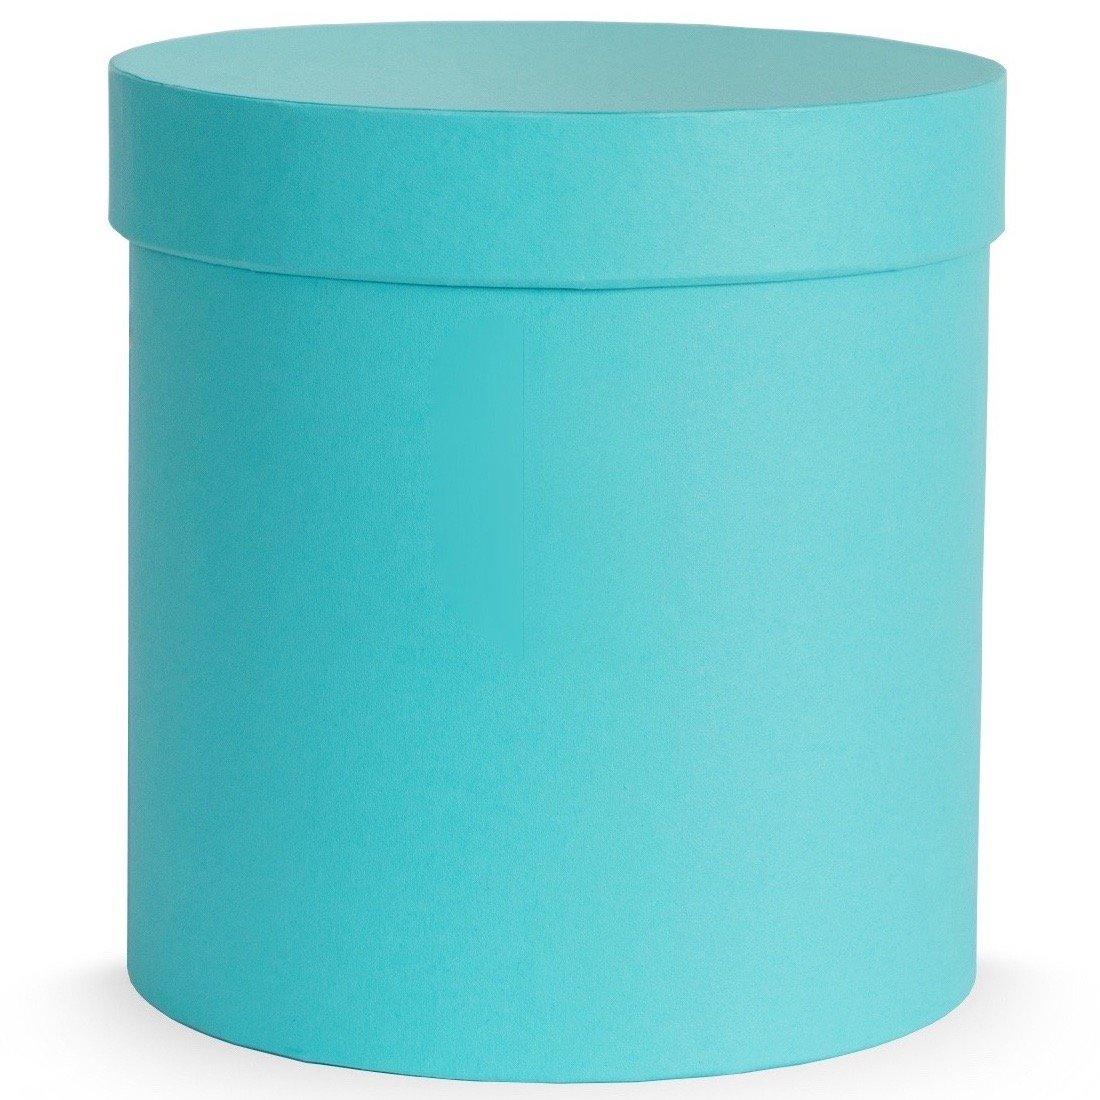 Blumenedenwelt DIY Flowerbox Set – Rotondo – Turchese – 15 x 16 cm – Oasis – Nastro in Bianco – Senza Fiori – Senza Logo – Idee Regalo